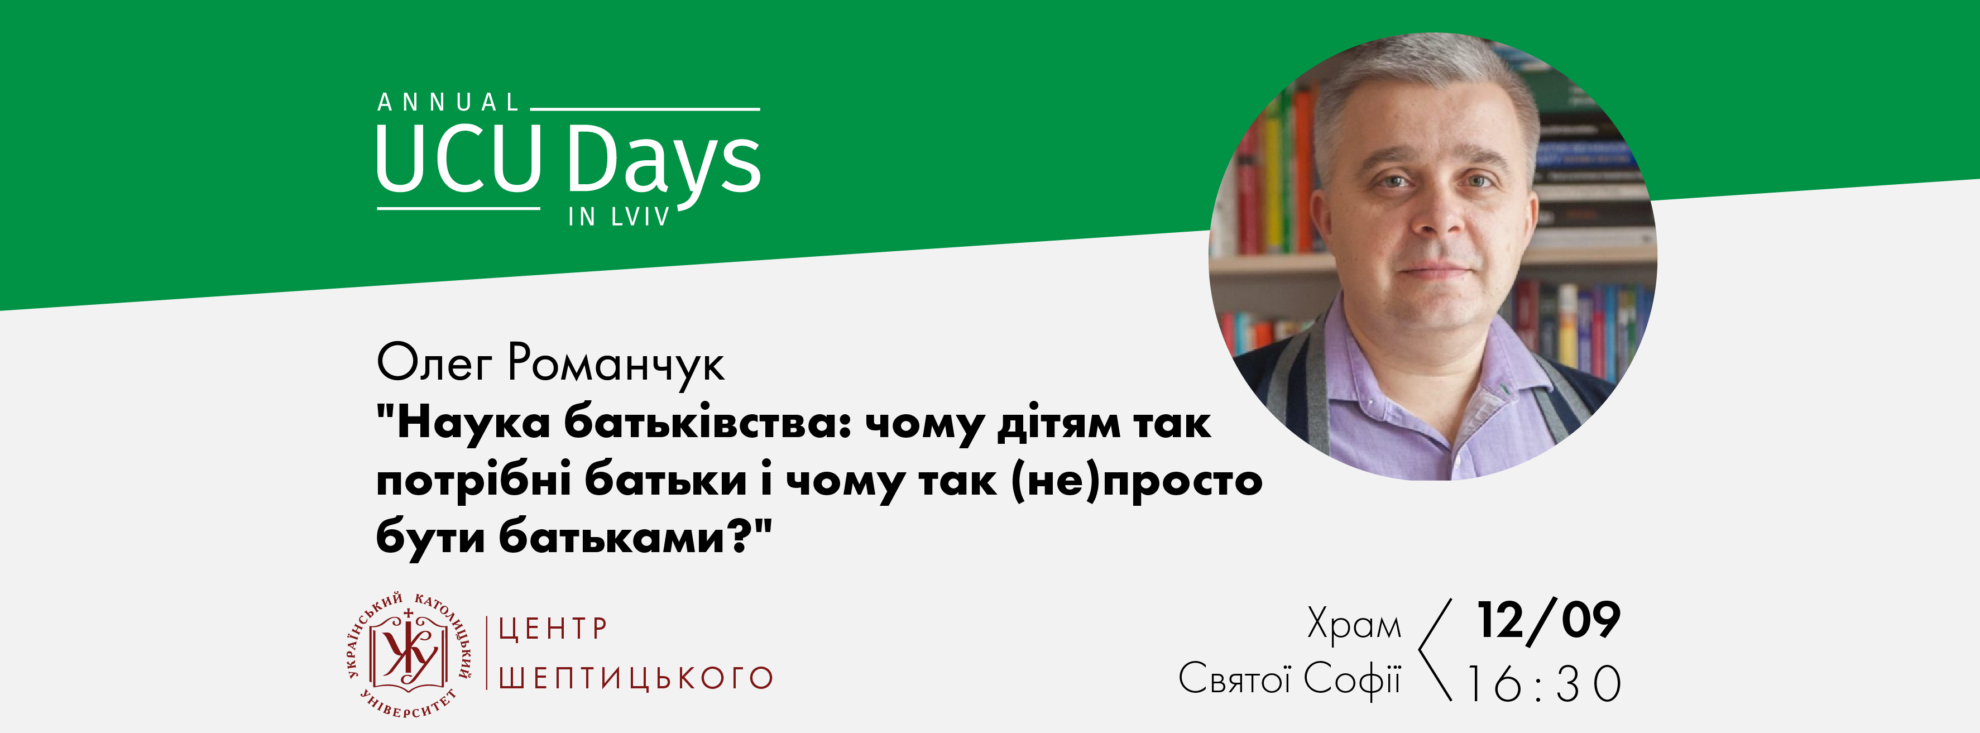 "Лекція Олега Романчука ""Наука батьківства"""